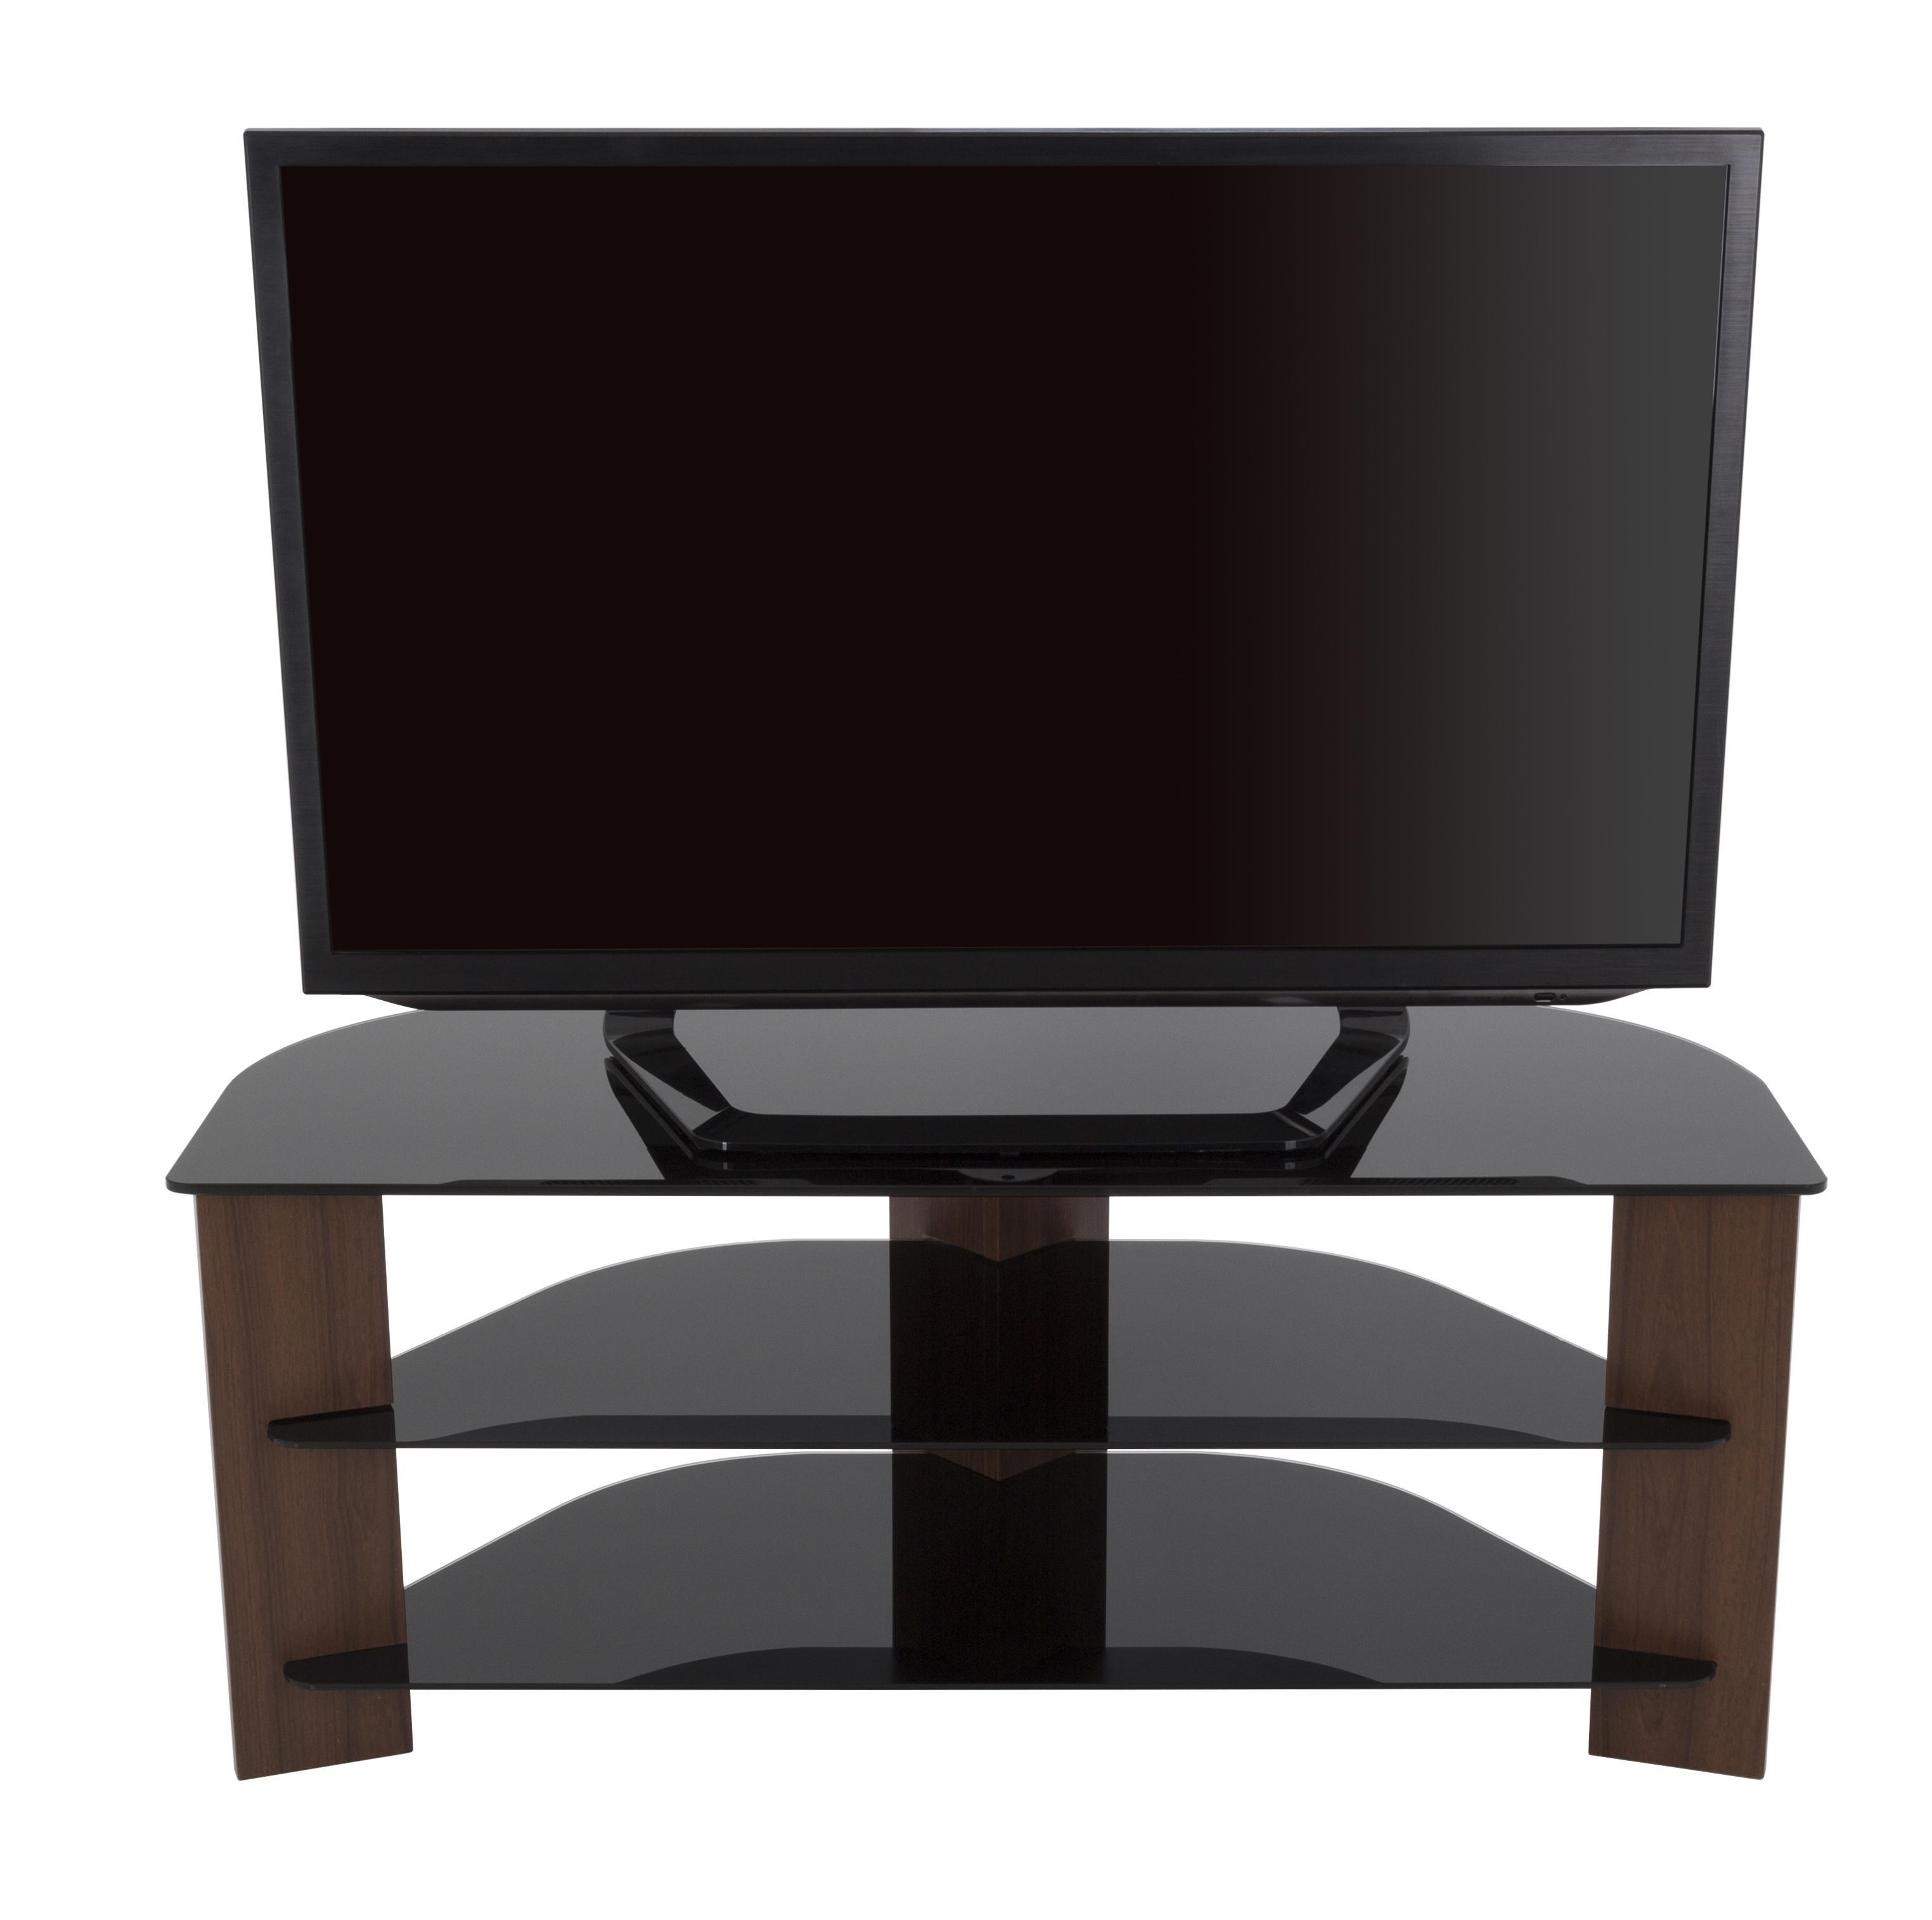 Avf fs1100varwb a varano tv stand with glass shelves for for Avf furniture